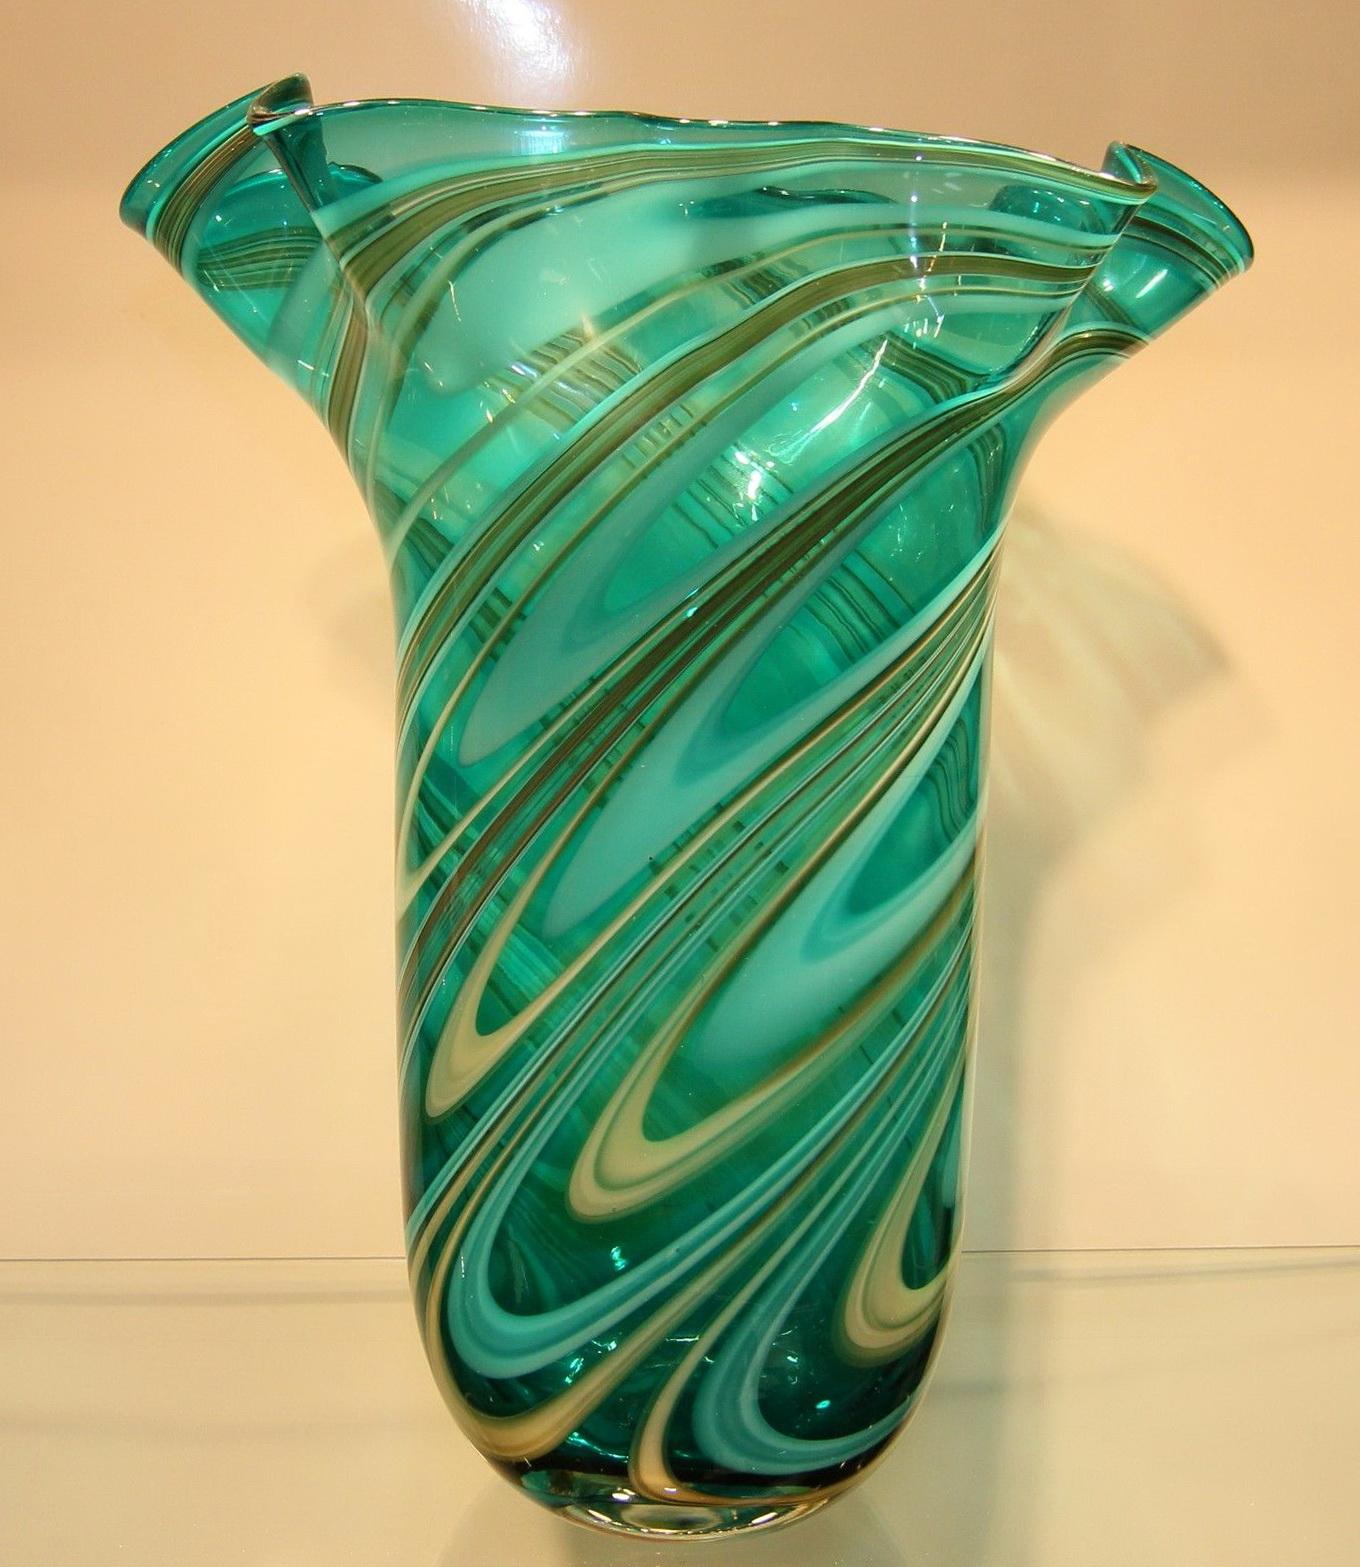 Murano glass vases ebay home design ideas murano glass vases ebay floridaeventfo Images